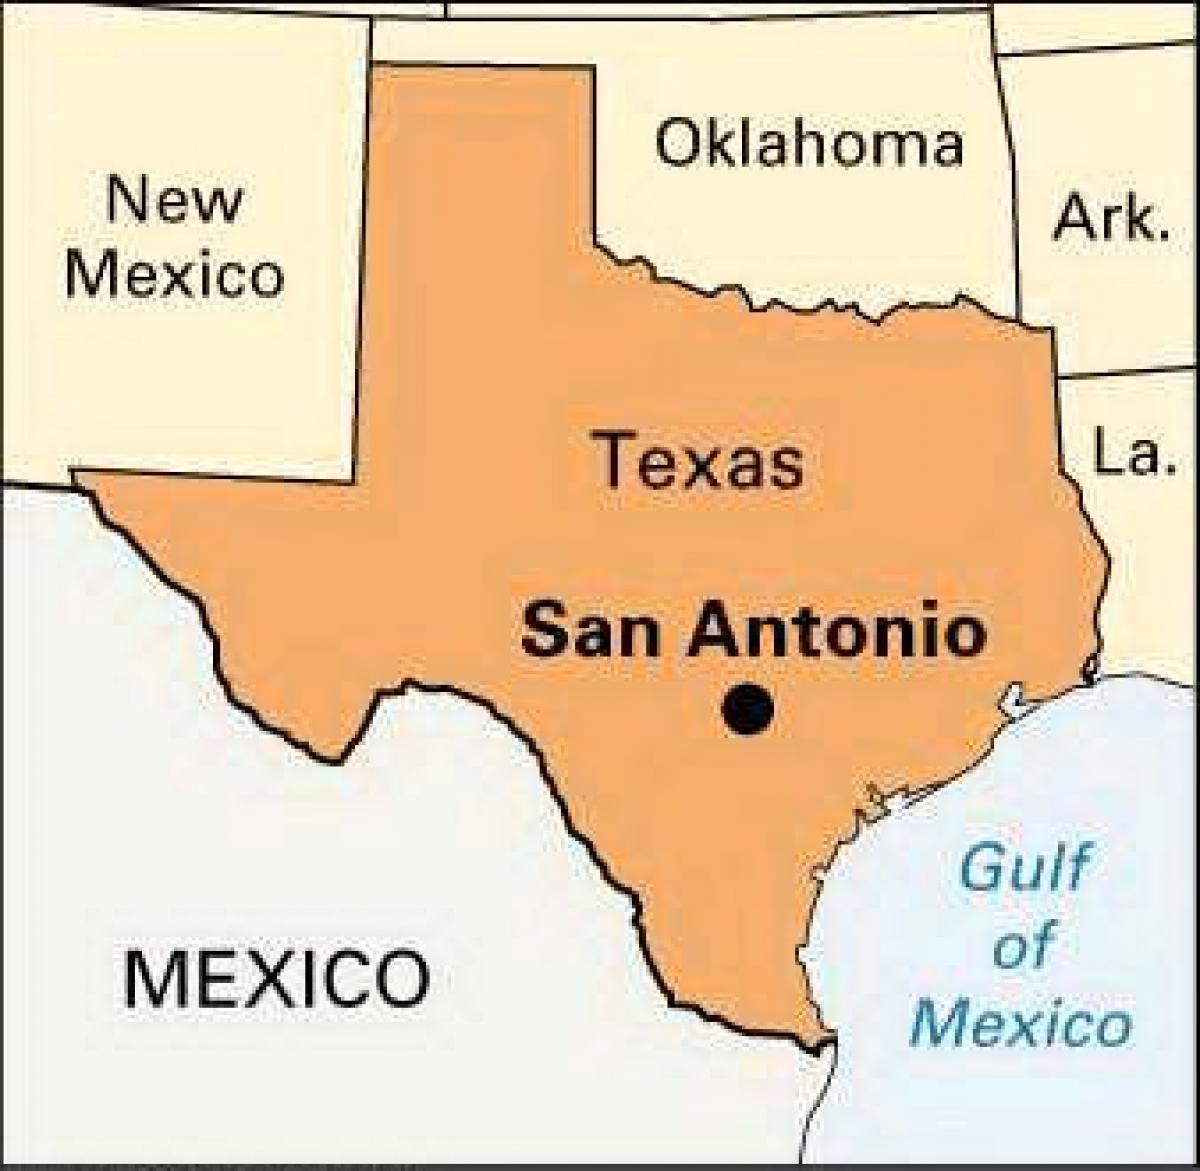 Texas Map San Antonio - San Antonio Map Of Texas (Texas - Usa) - San Antonio Texas Maps